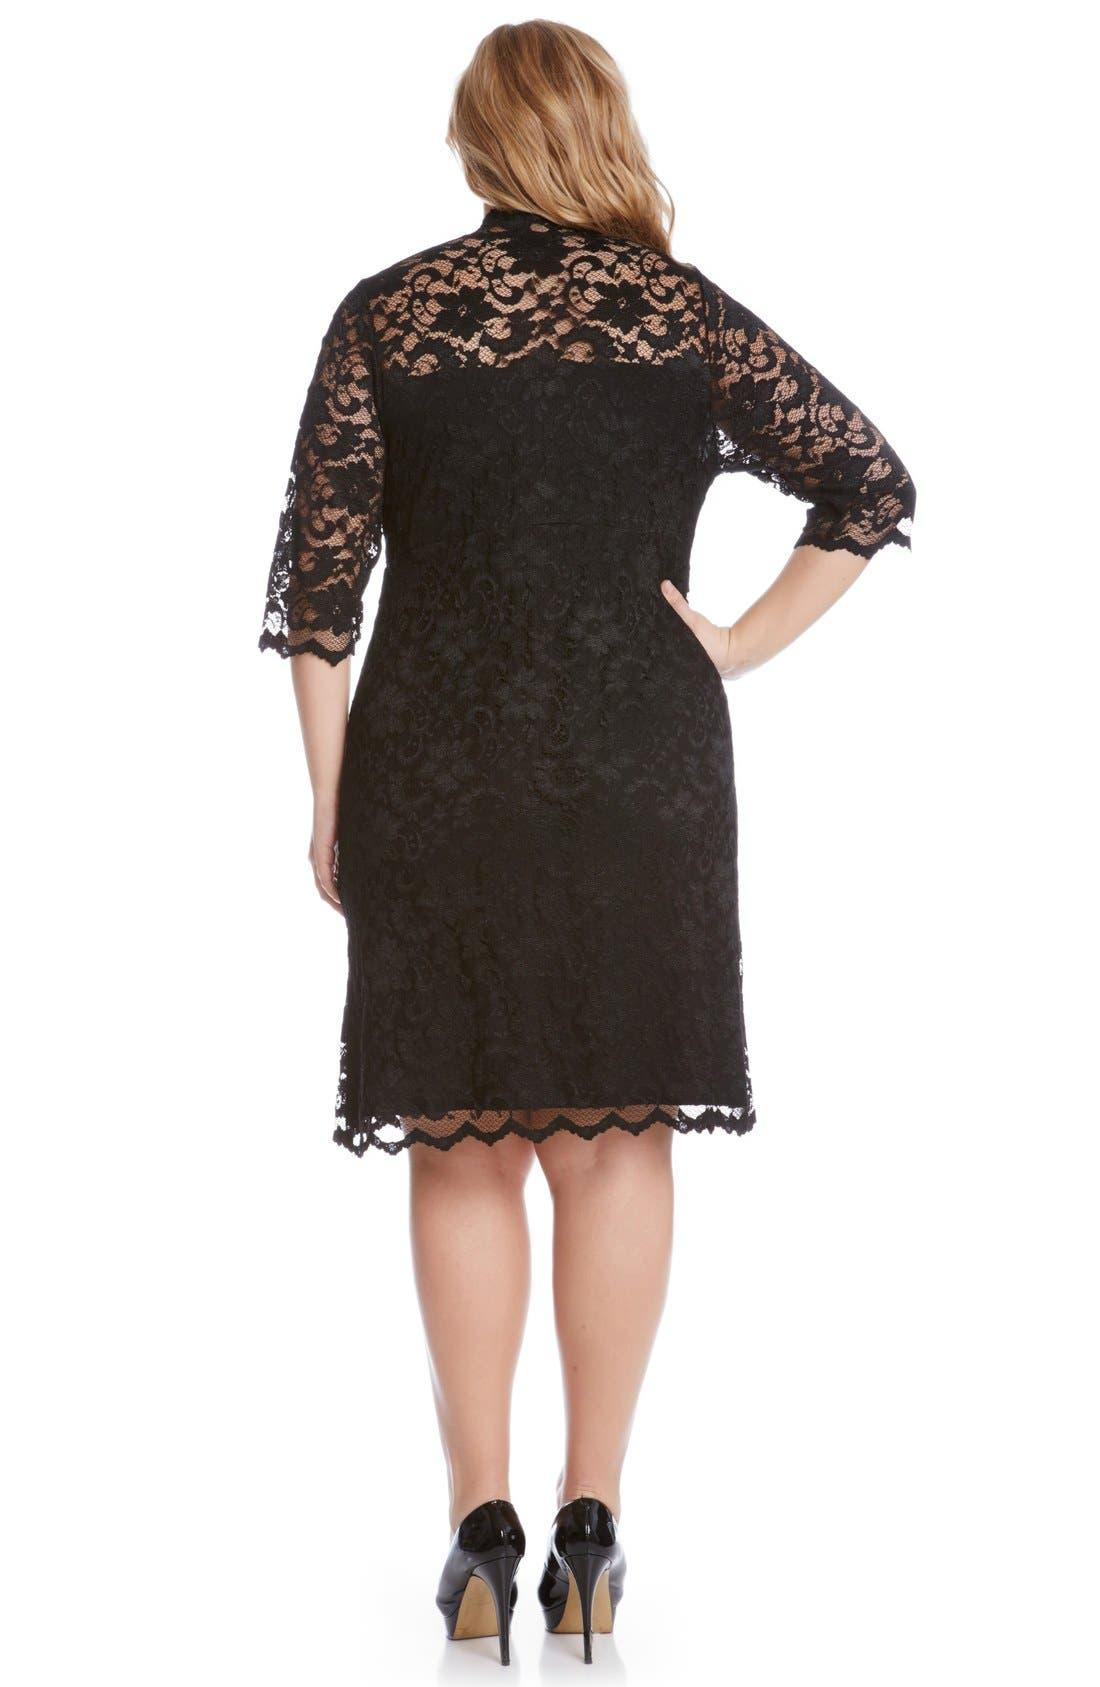 KAREN KANE, Scalloped Stretch Lace Dress, Alternate thumbnail 2, color, BLACK